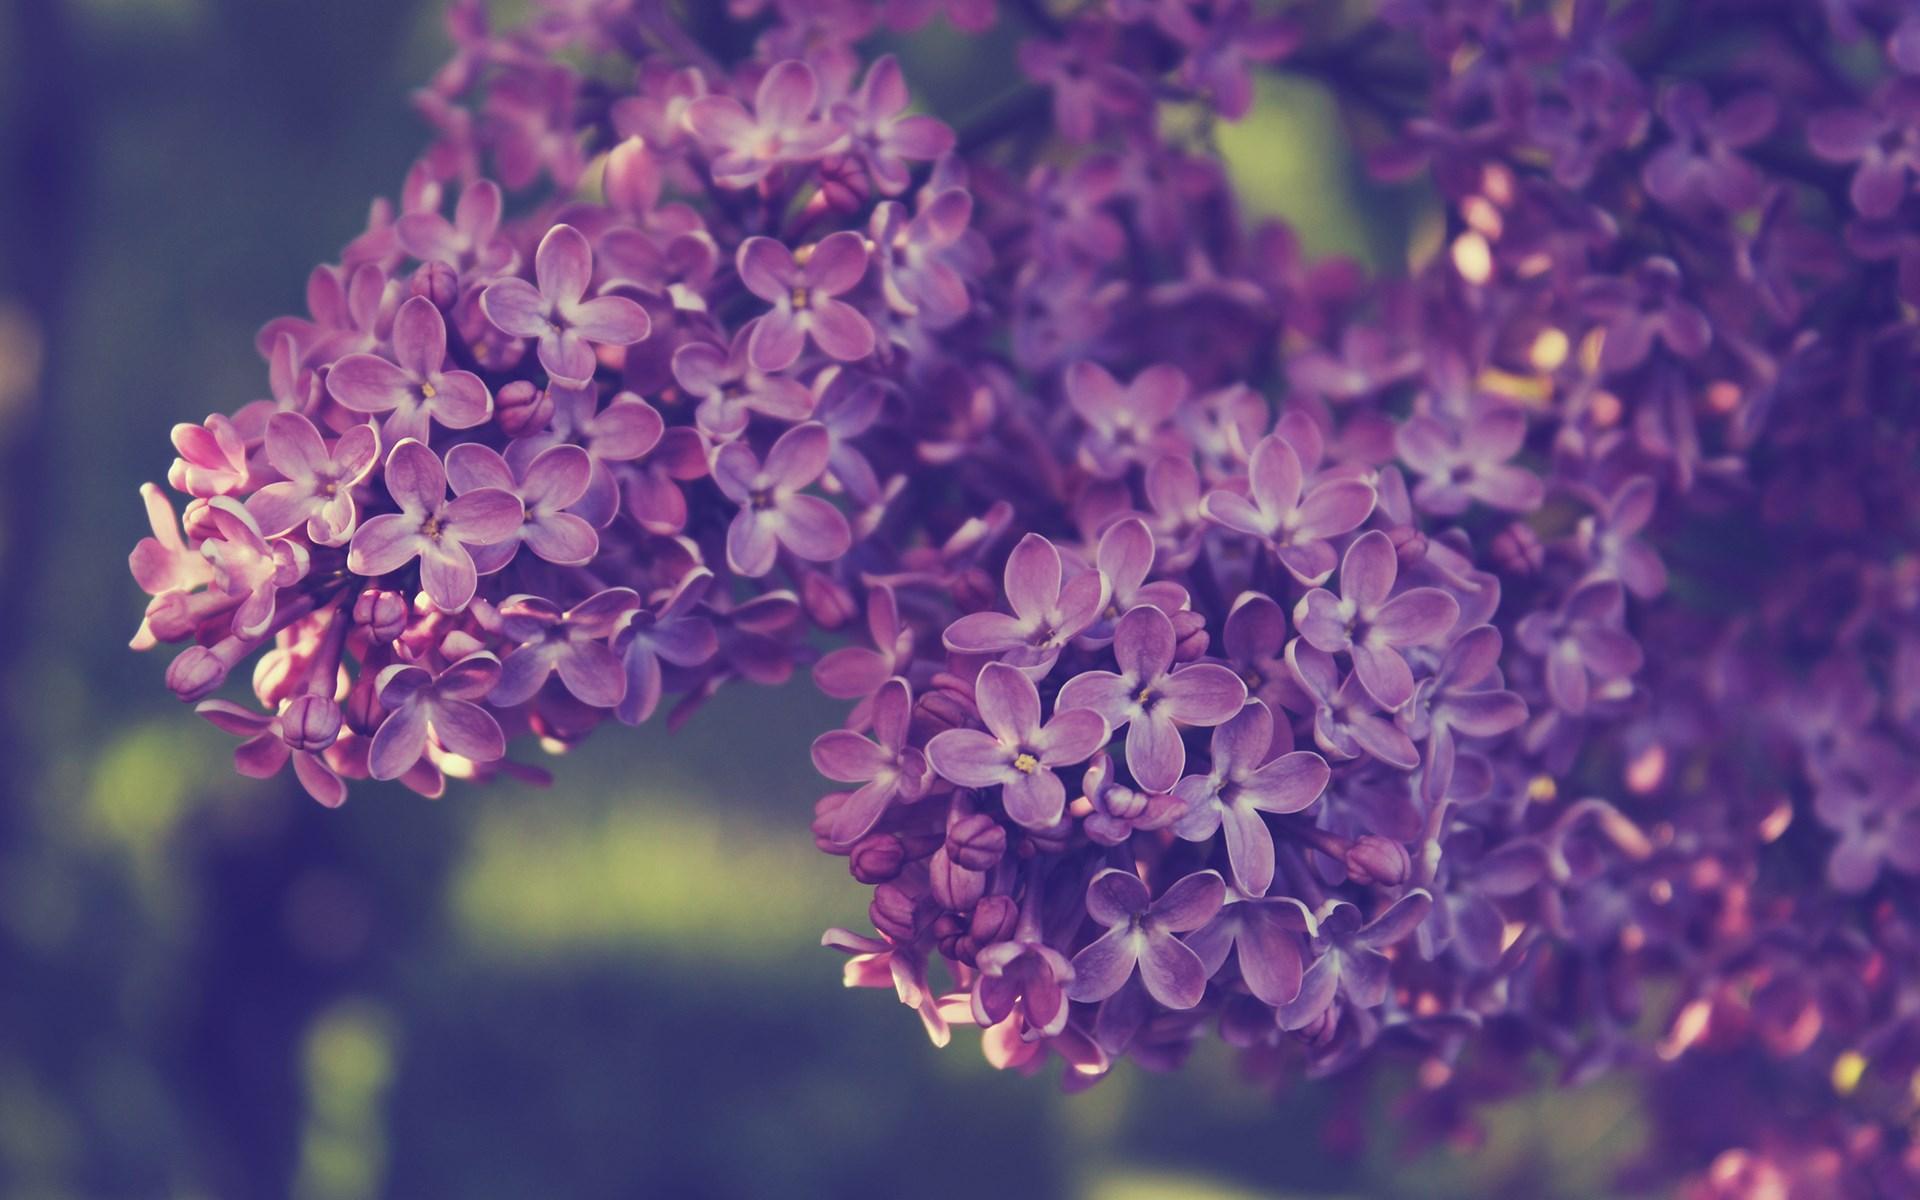 Cute Wallpapers For Laptop Esthetic Syringa Lilac Flowers Hd Desktop Wallpapers 4k Hd